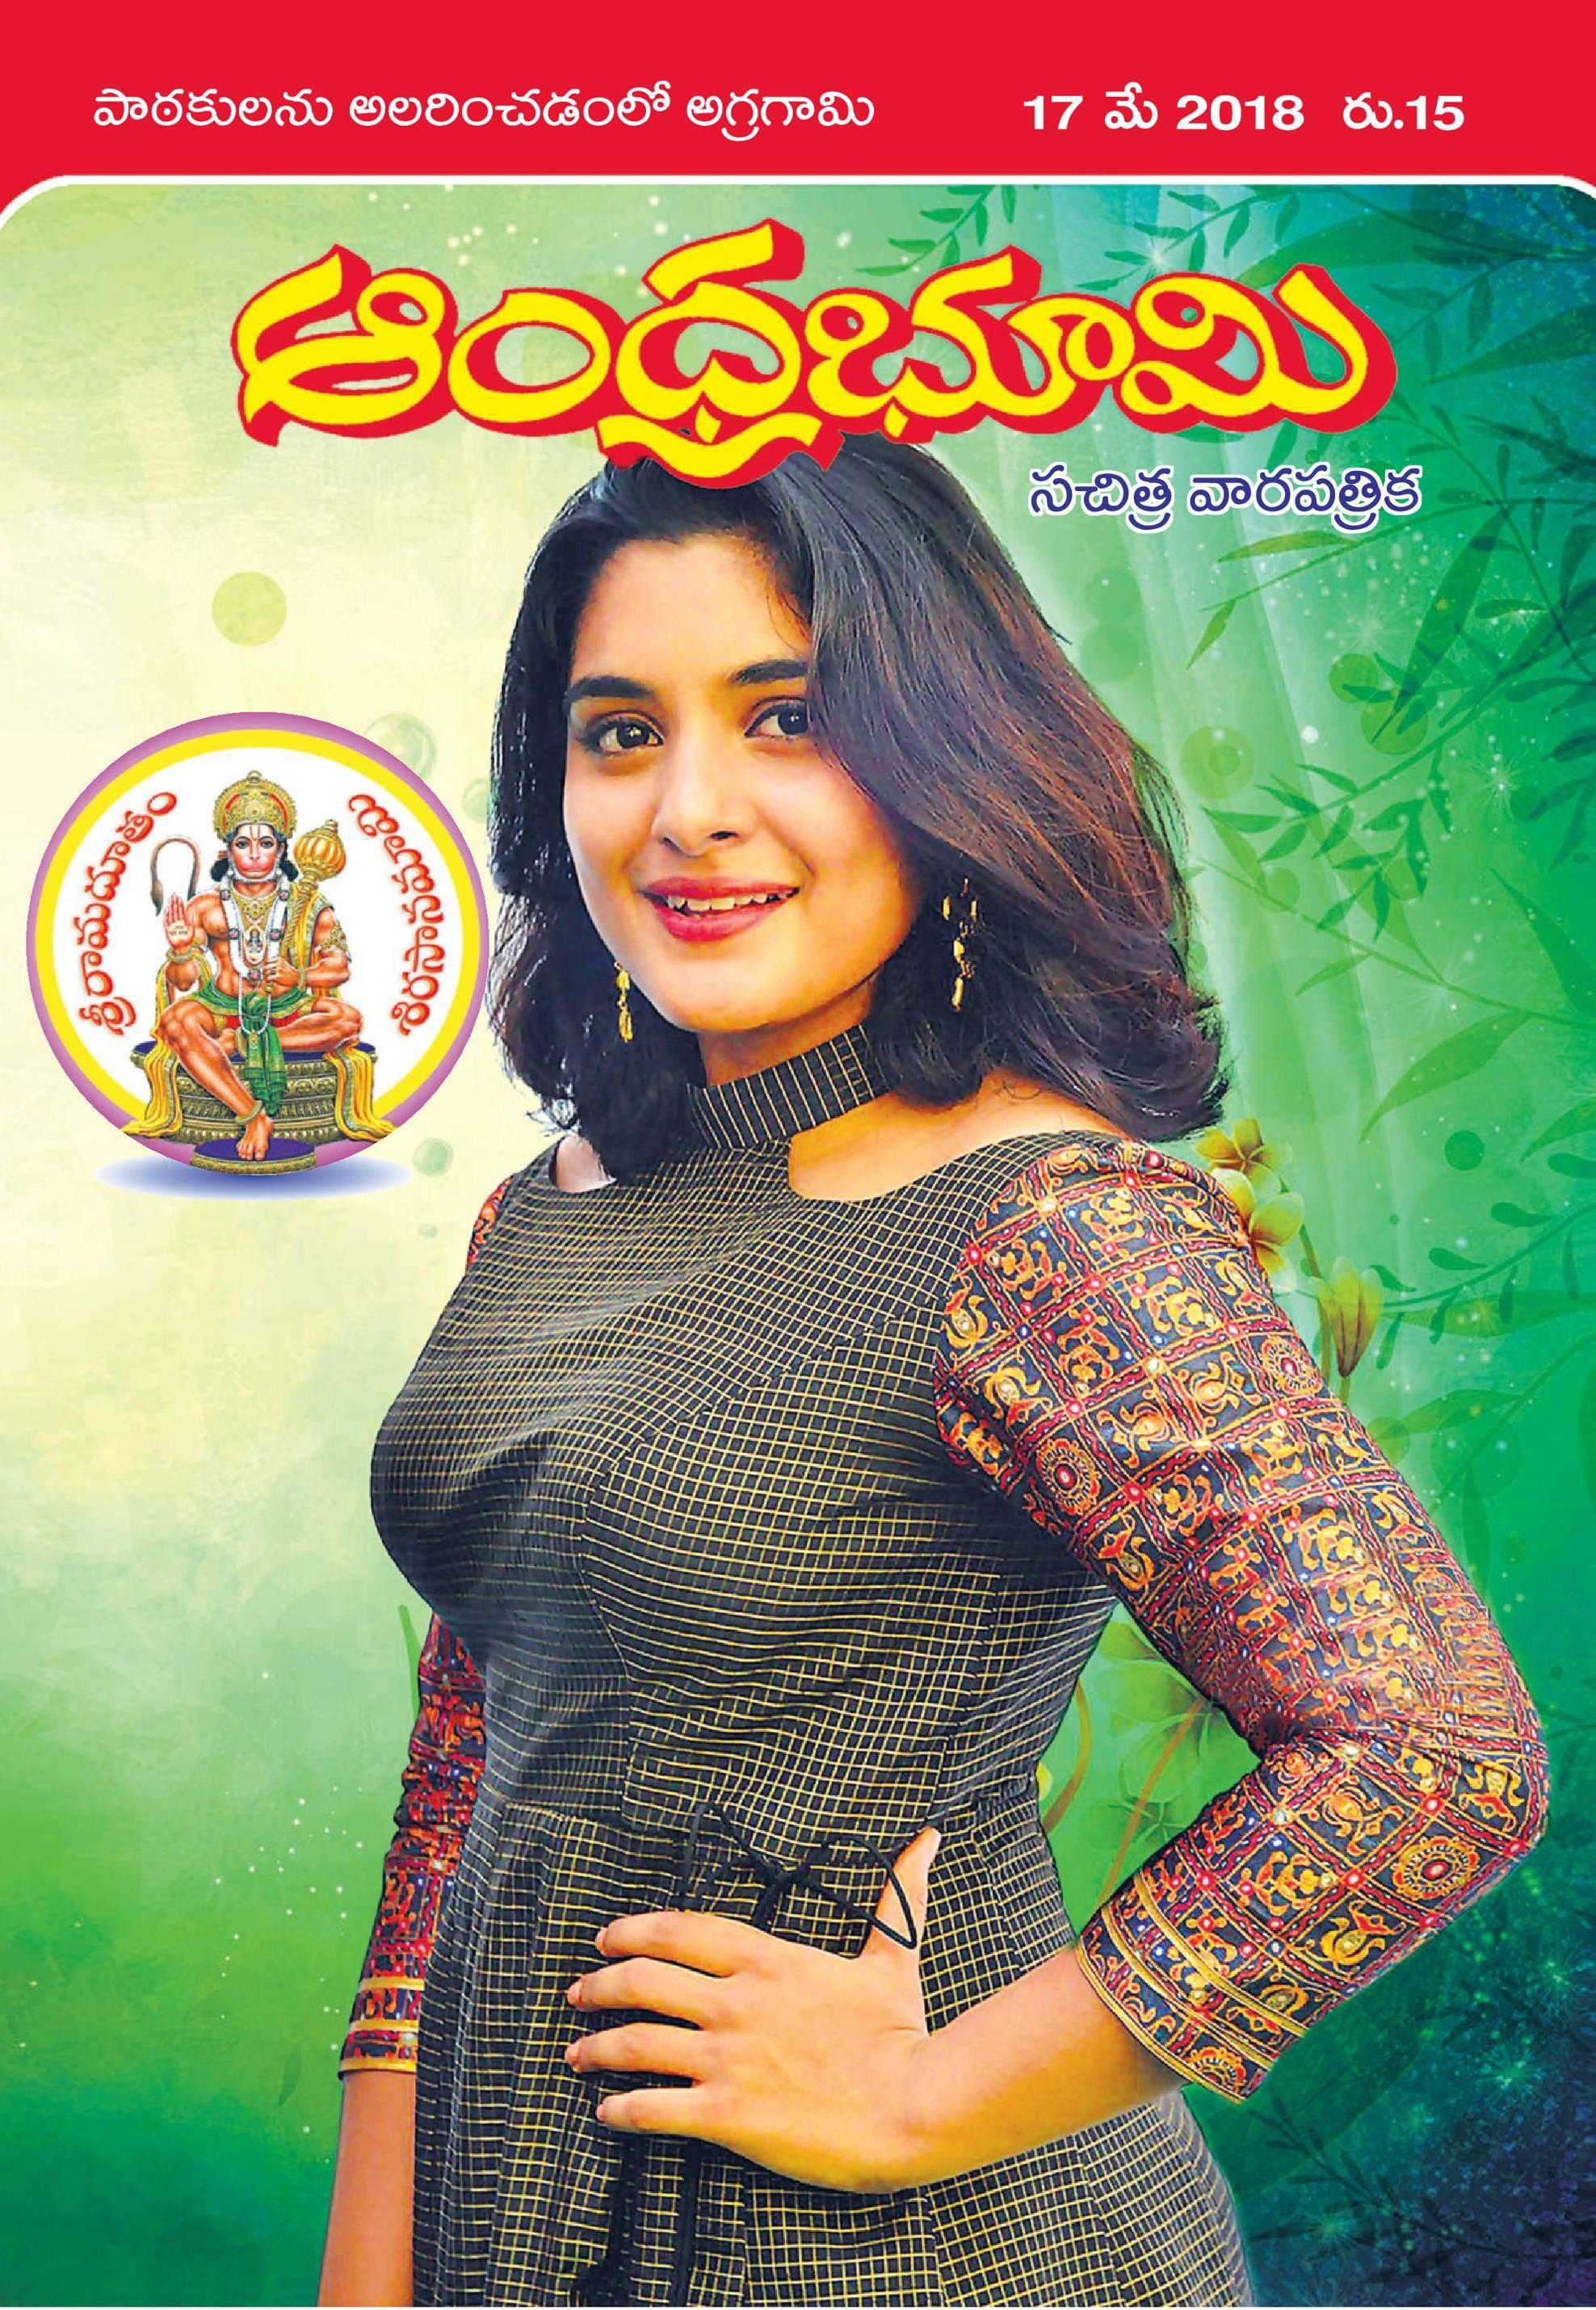 Andhra Bhoomi Weekly - 18 మే 2018 / AvaxHome